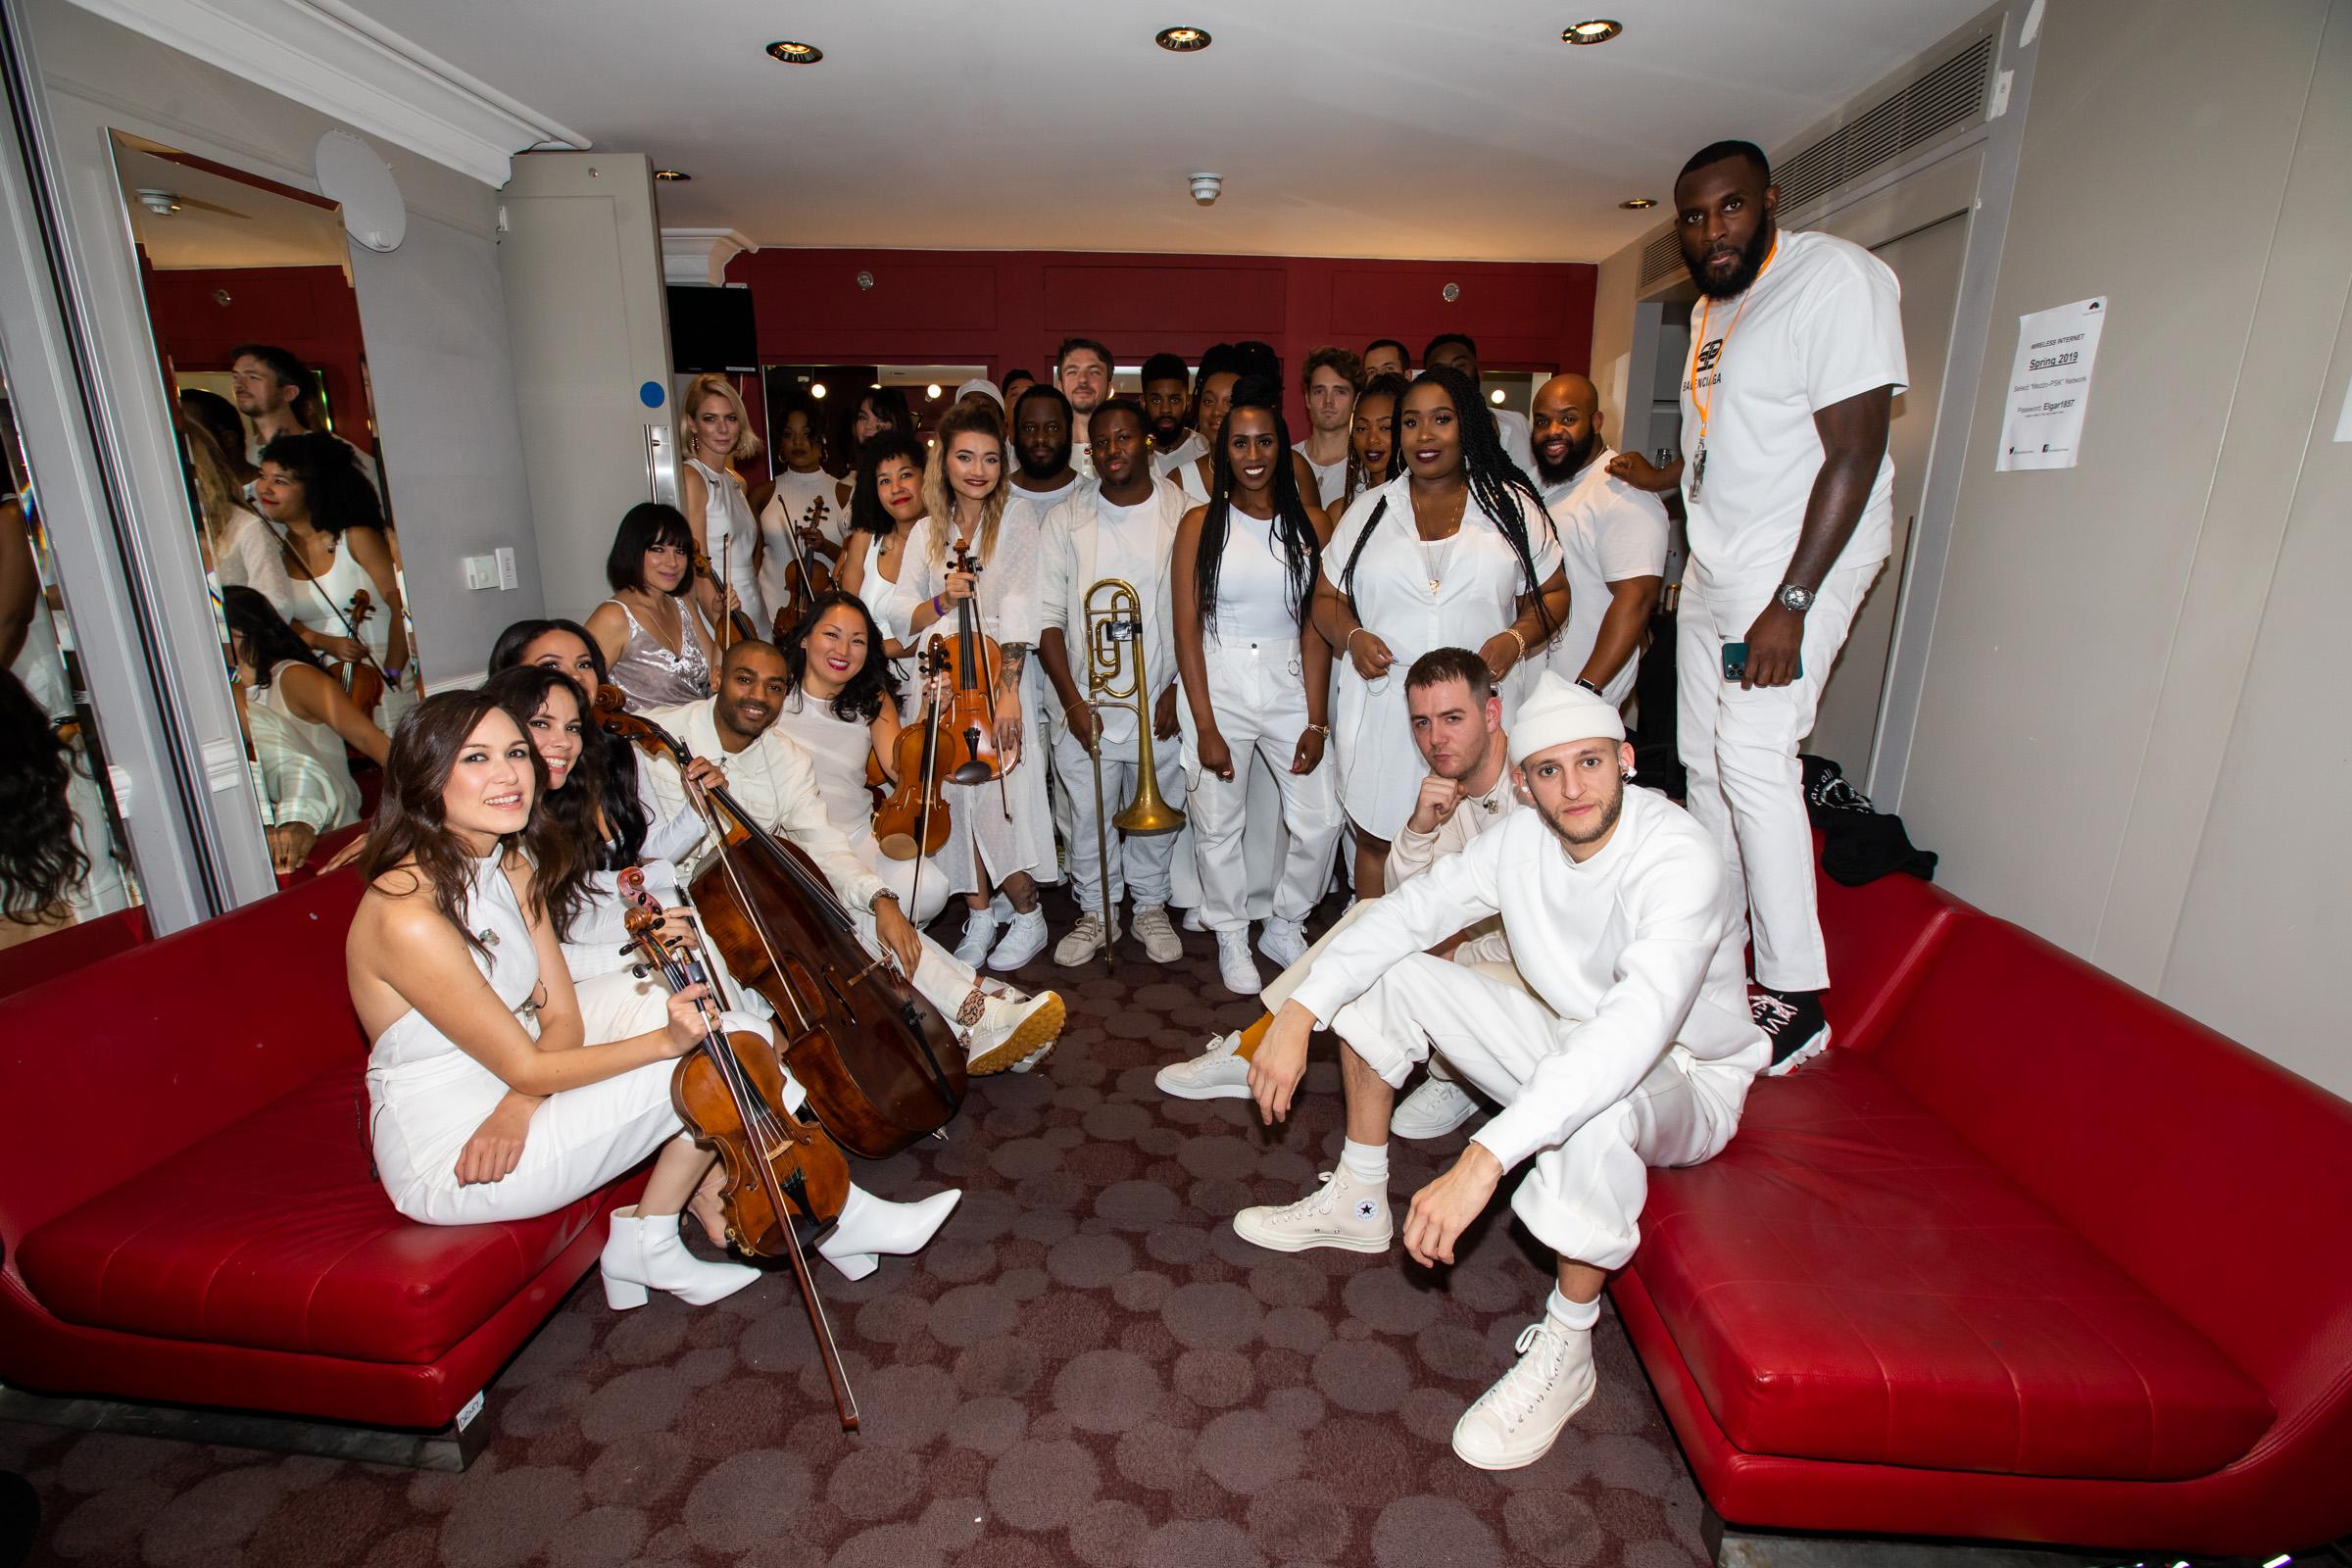 Kano Hoodies All Summer - Royal Albert Hall